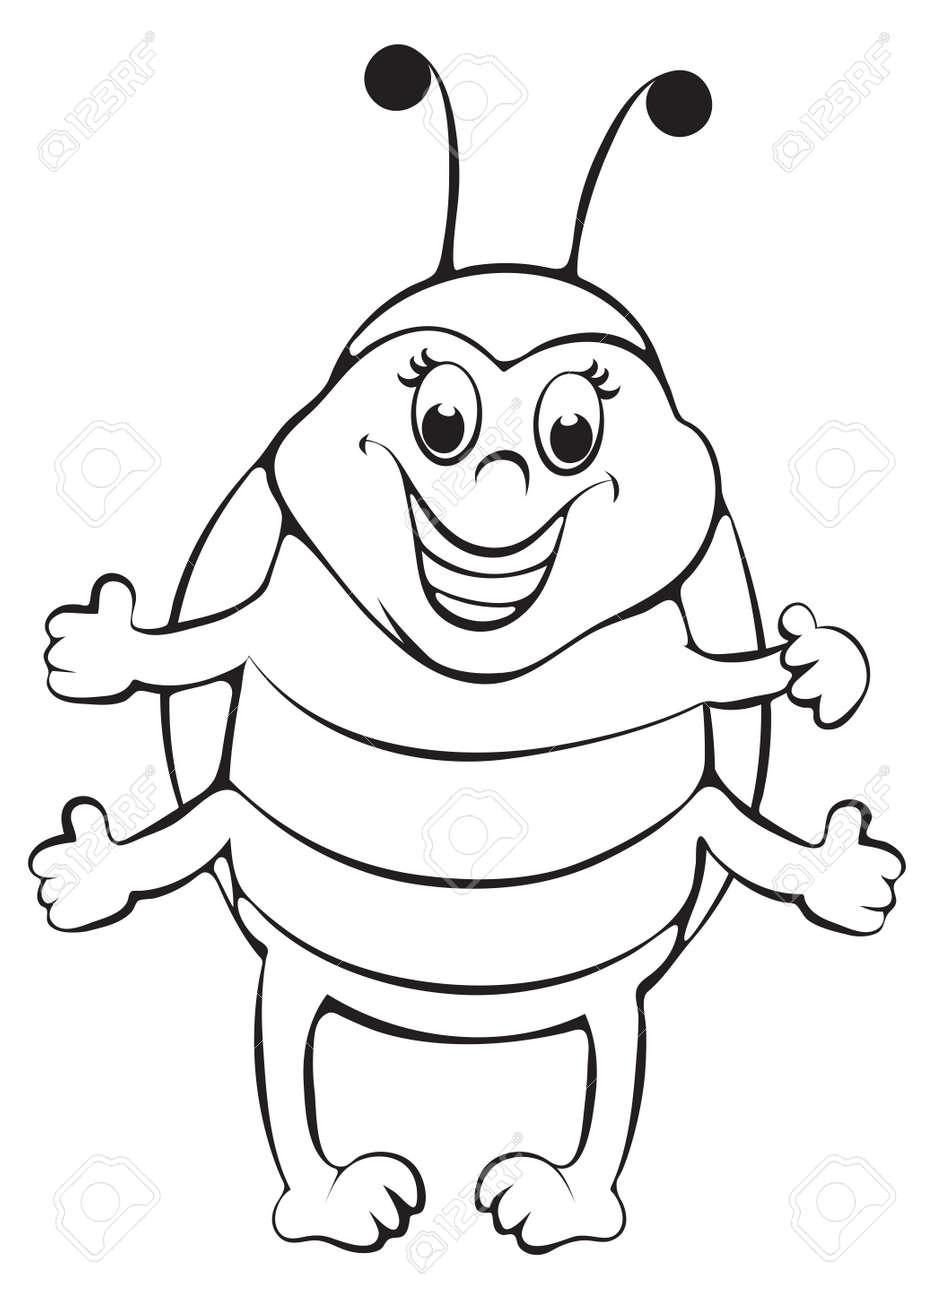 Funny ladybug  Outline illustration Stock Vector - 15245197